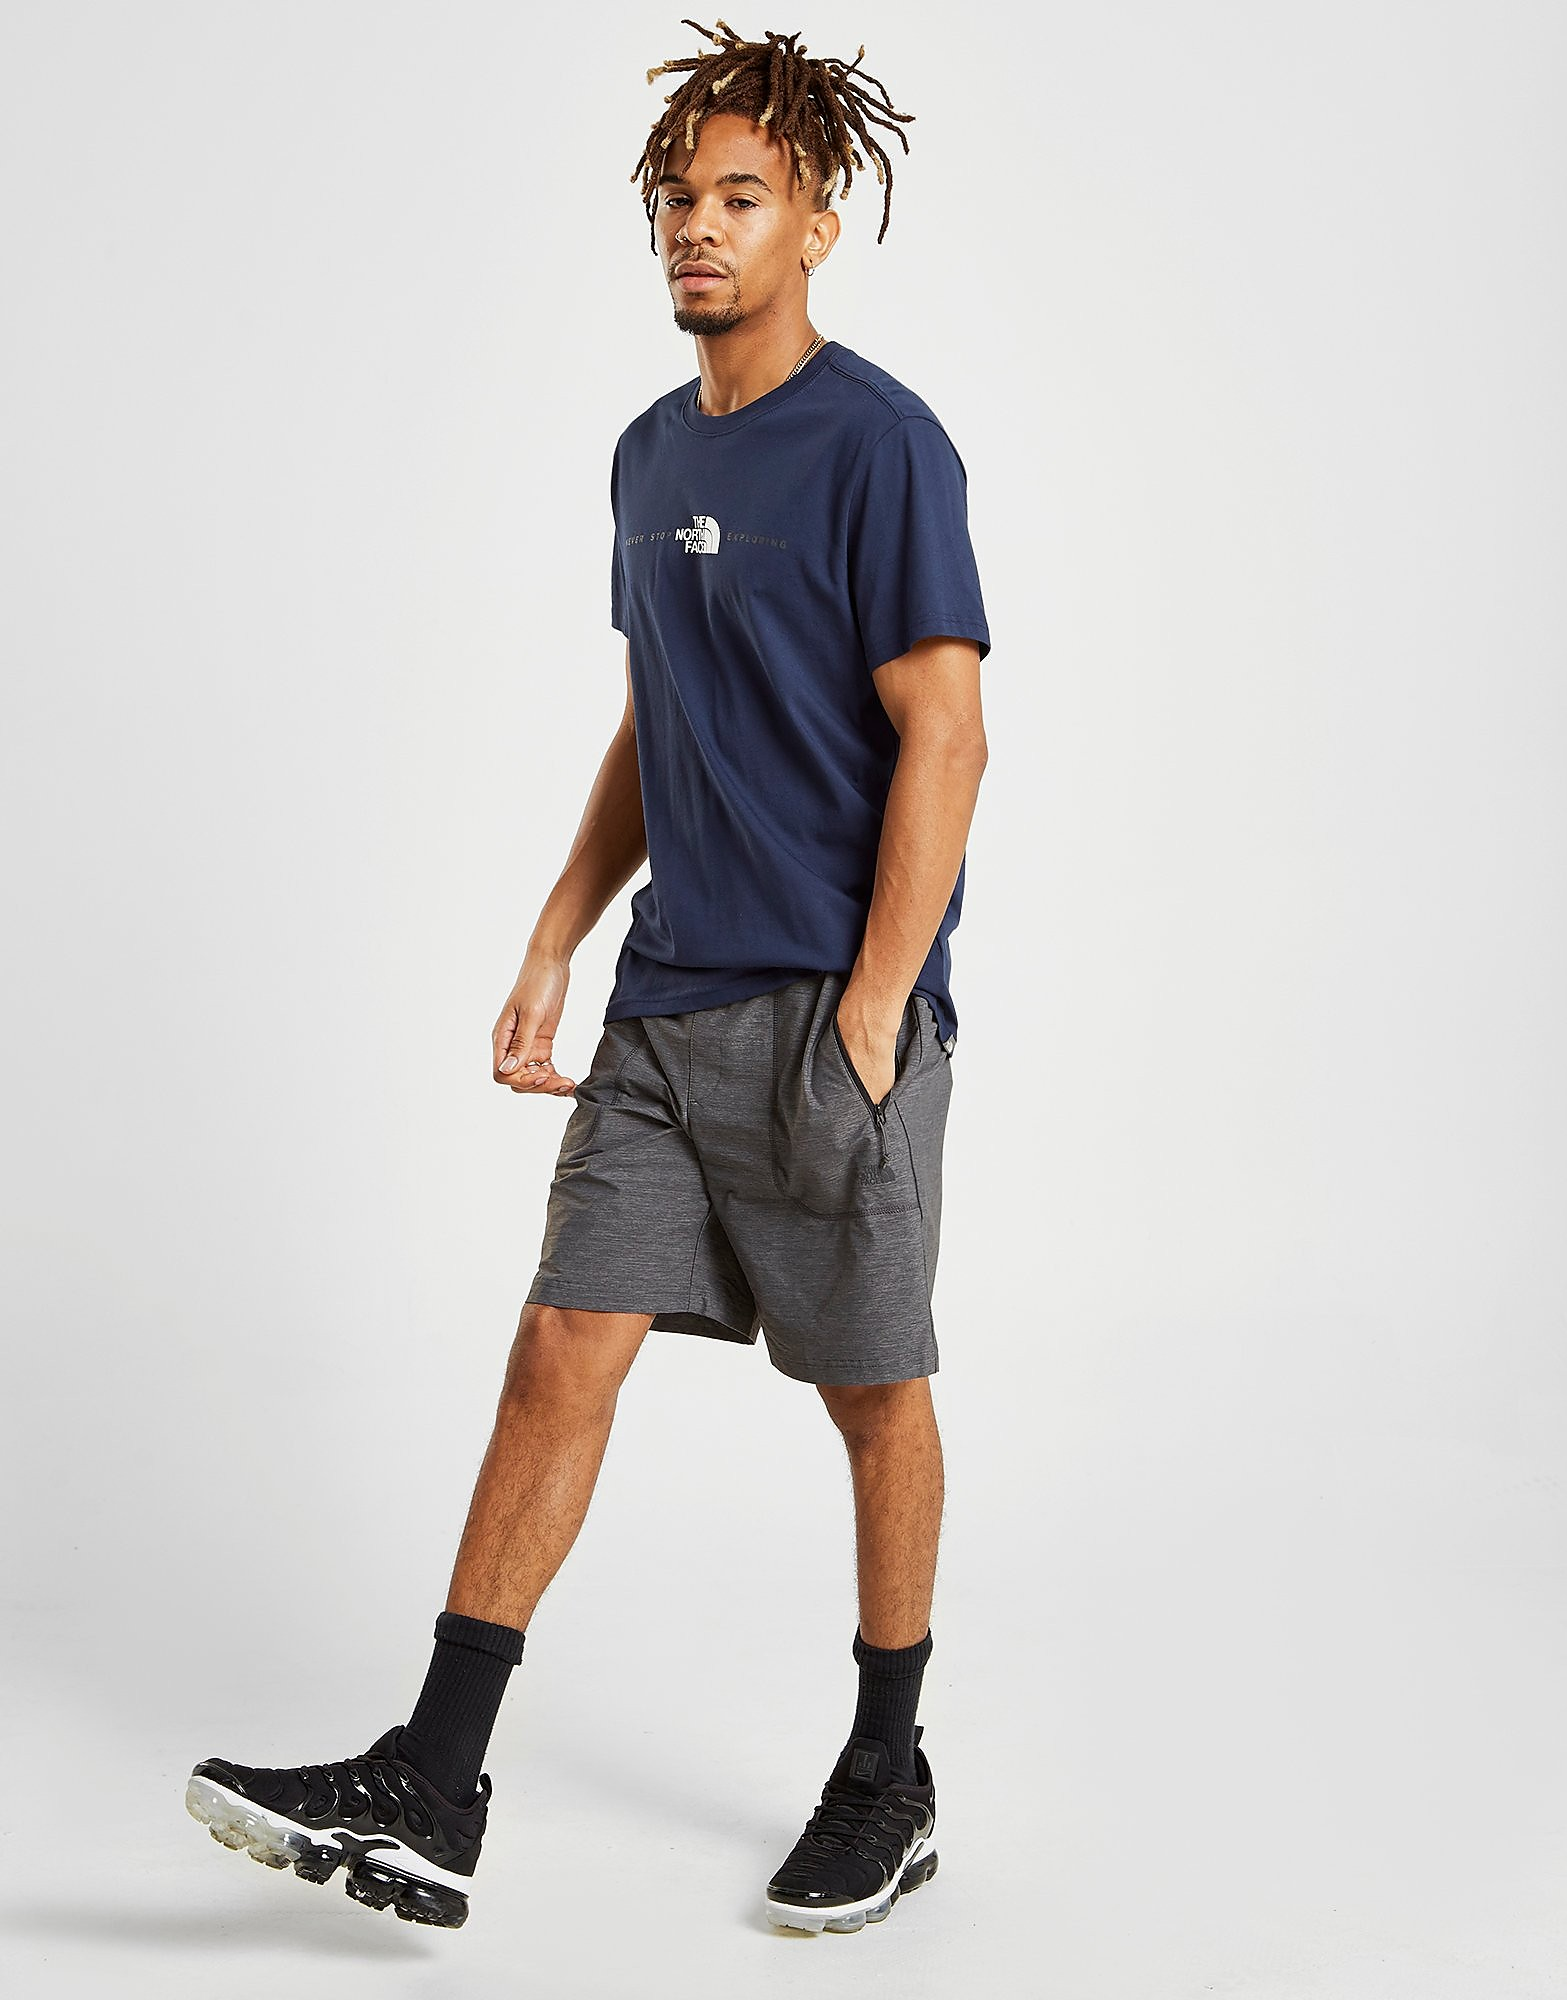 The North Face Ondras Shorts